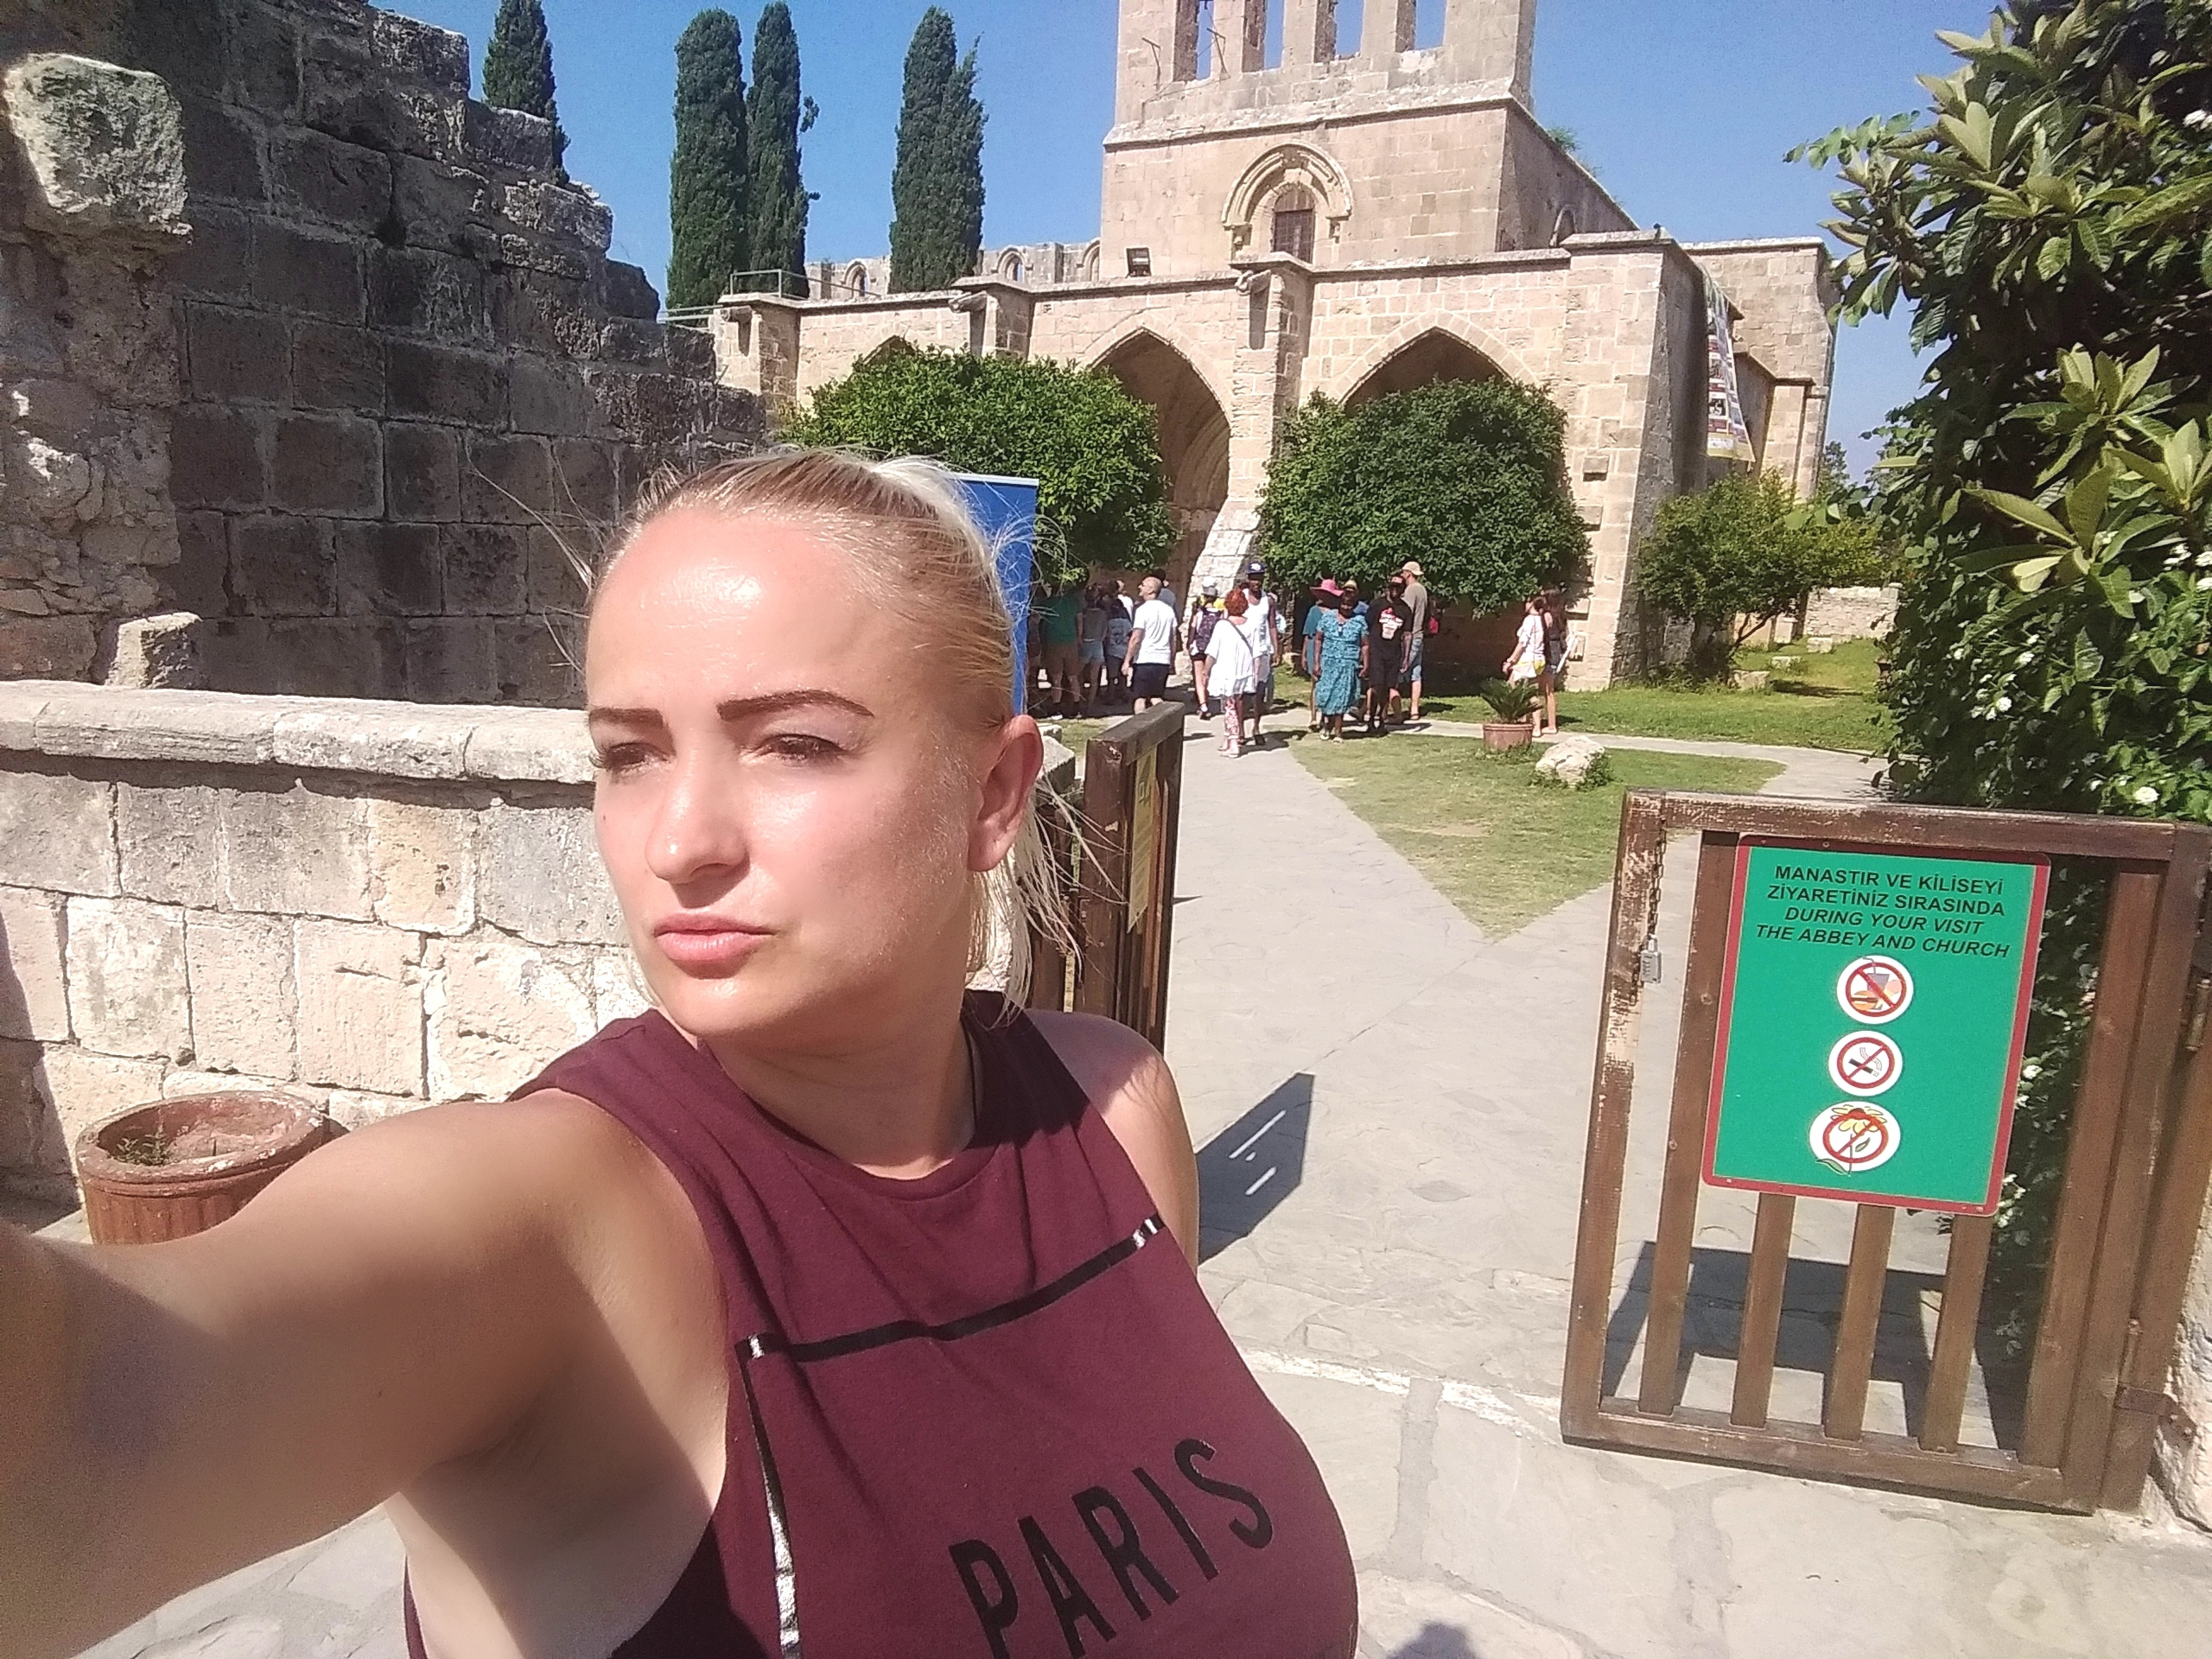 Елена Руденко (Валтея). Северный Кипр. Кериния и Фамагуста. (фото) LI0iLkXGr5w